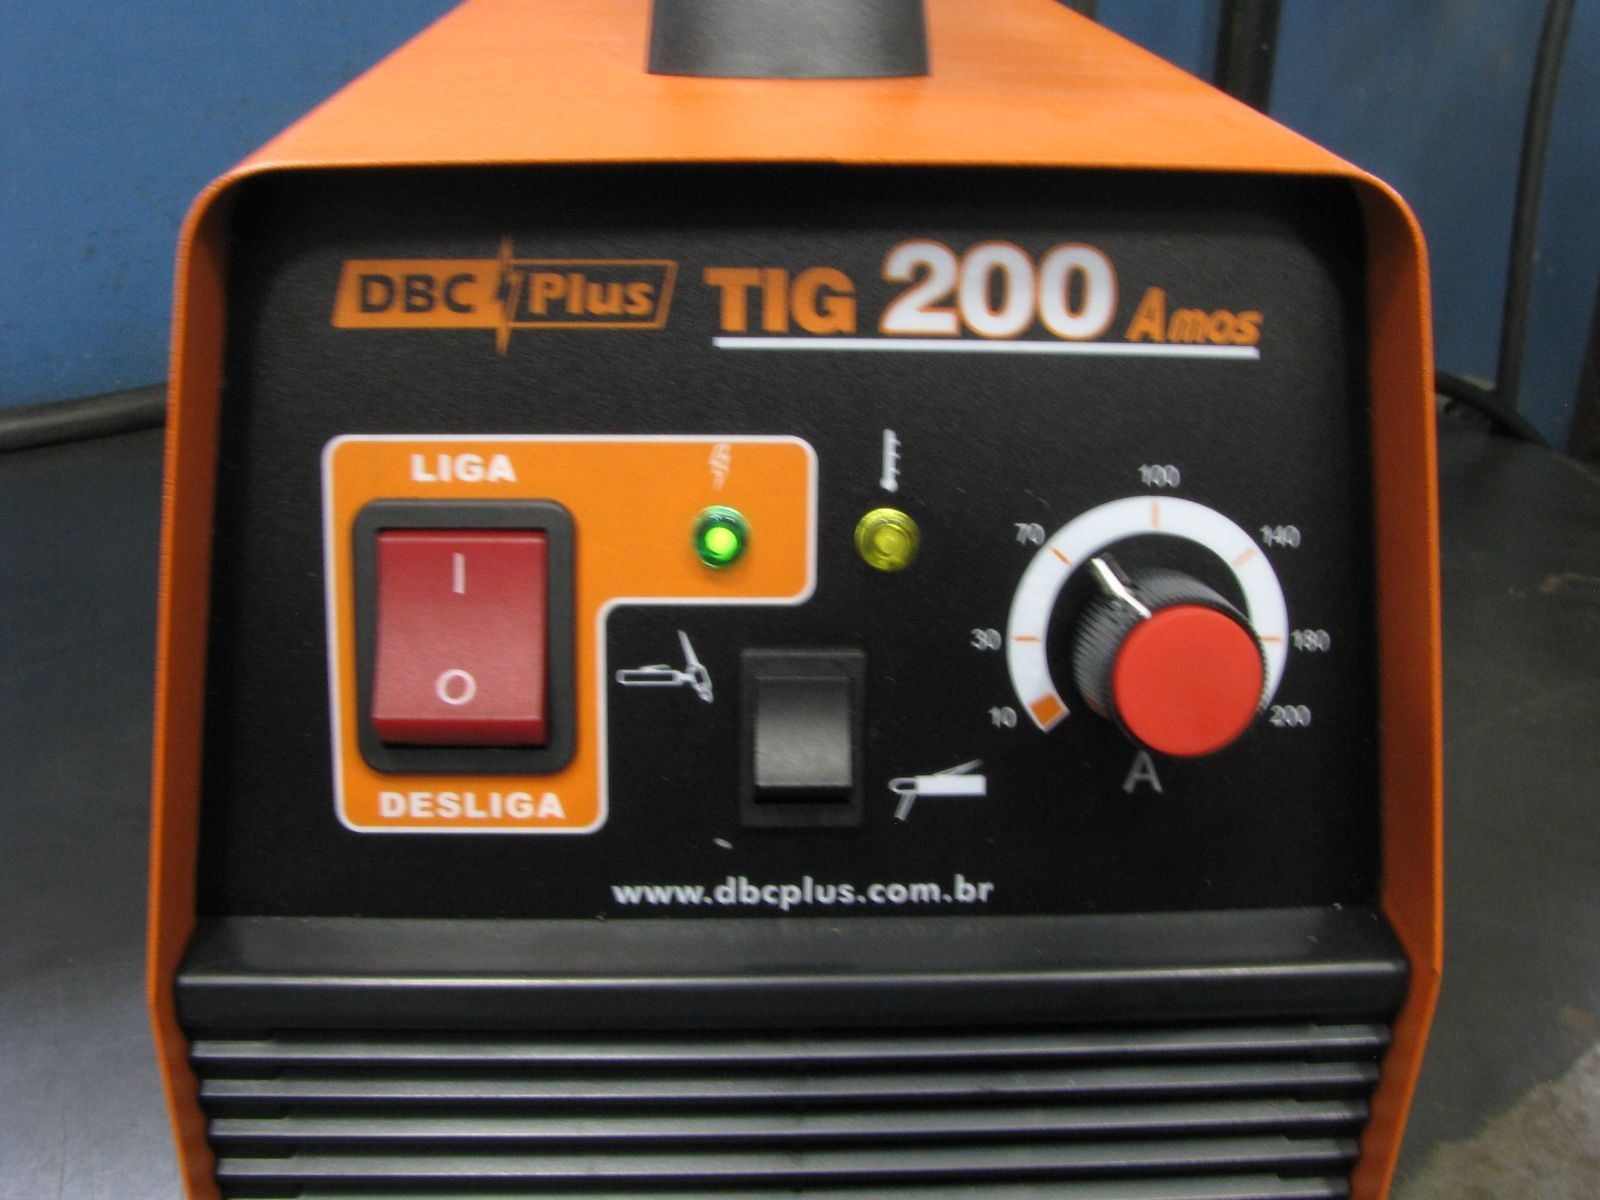 dbcplus_tig200a 094